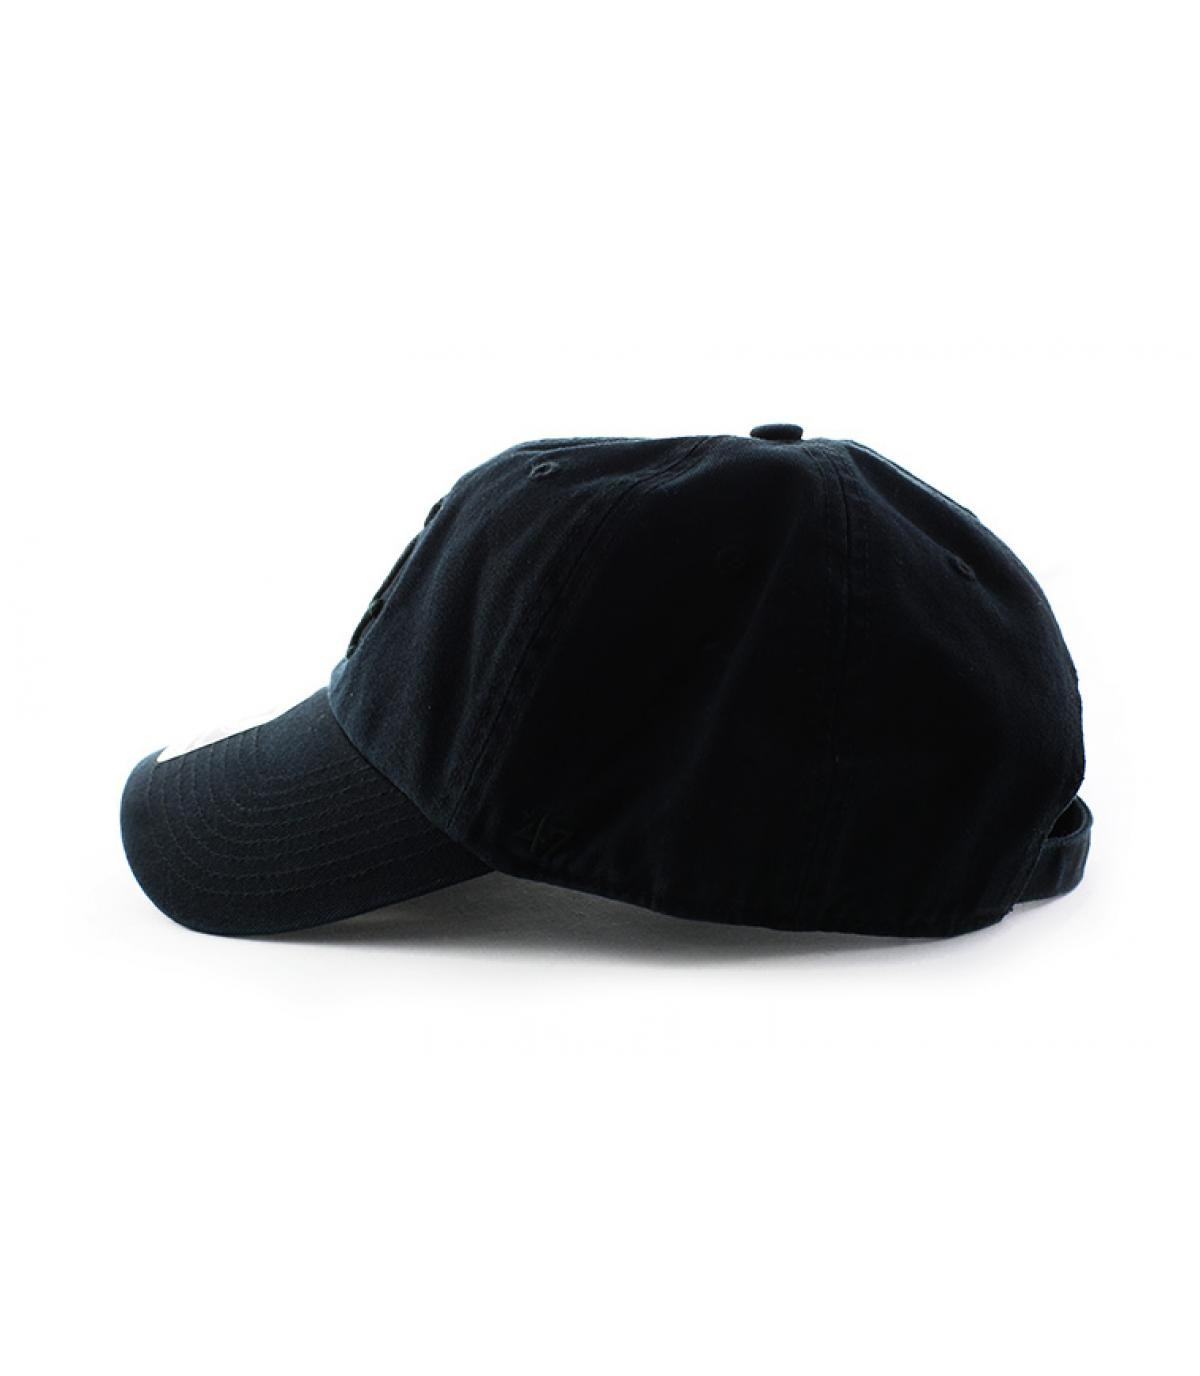 Detalles Clean Up Sox black black imagen 4